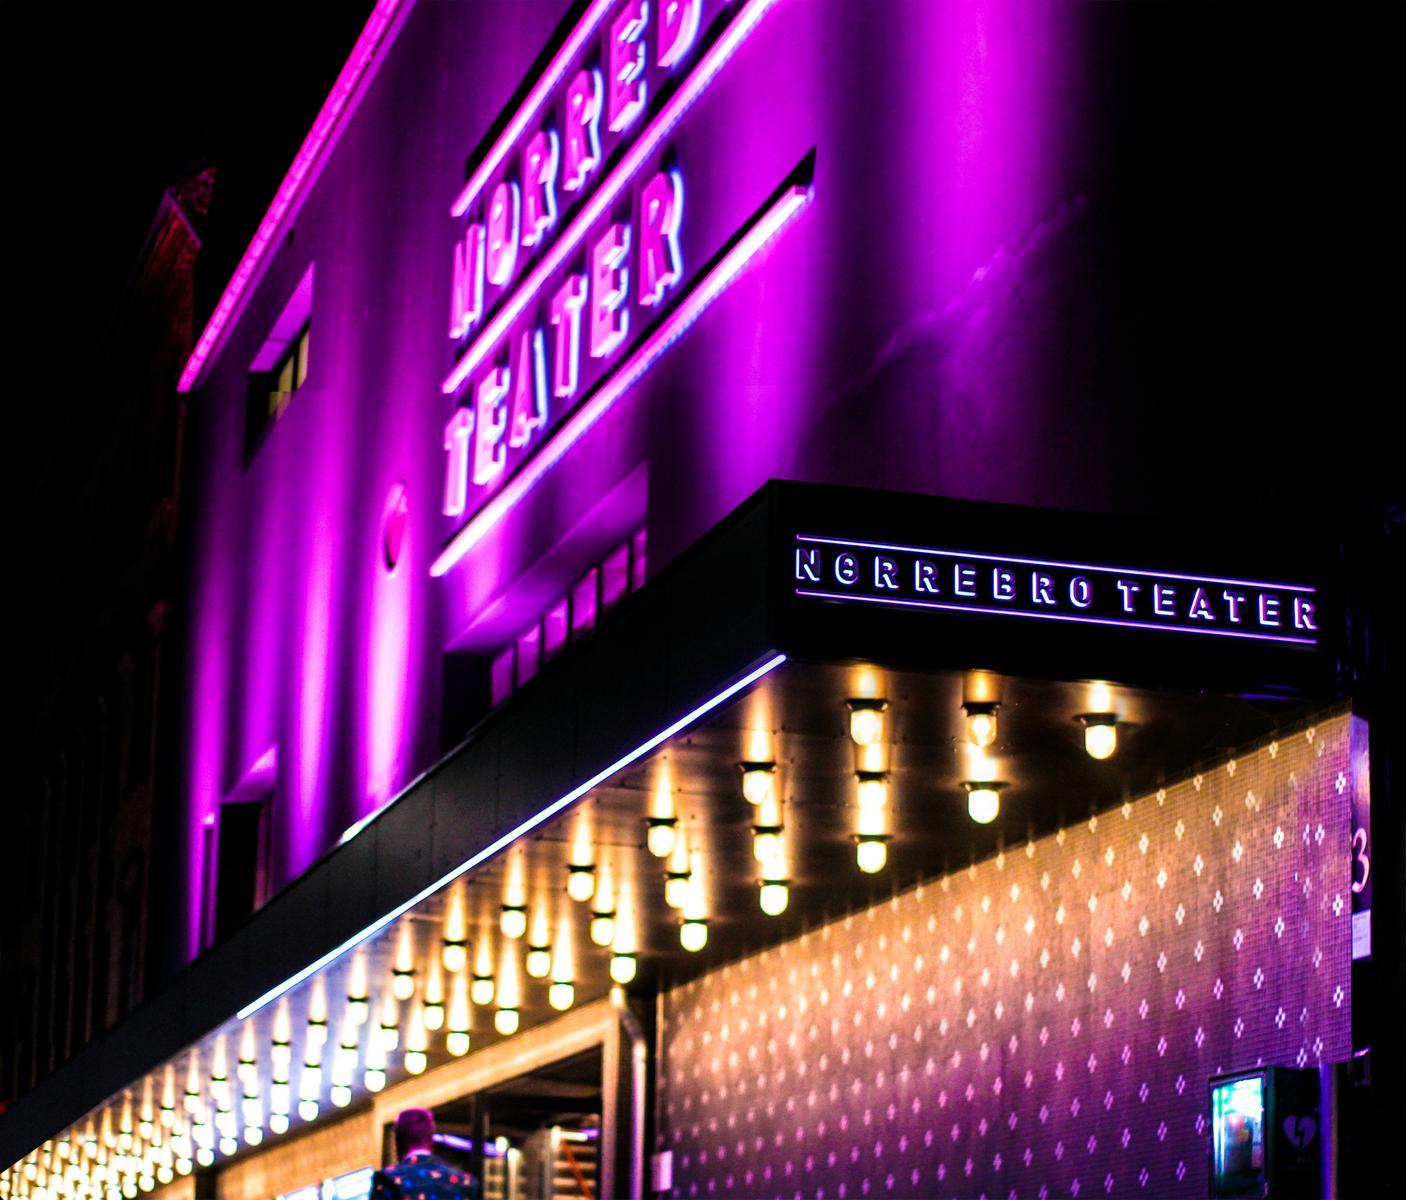 Spotlight: Nørrebro Teater